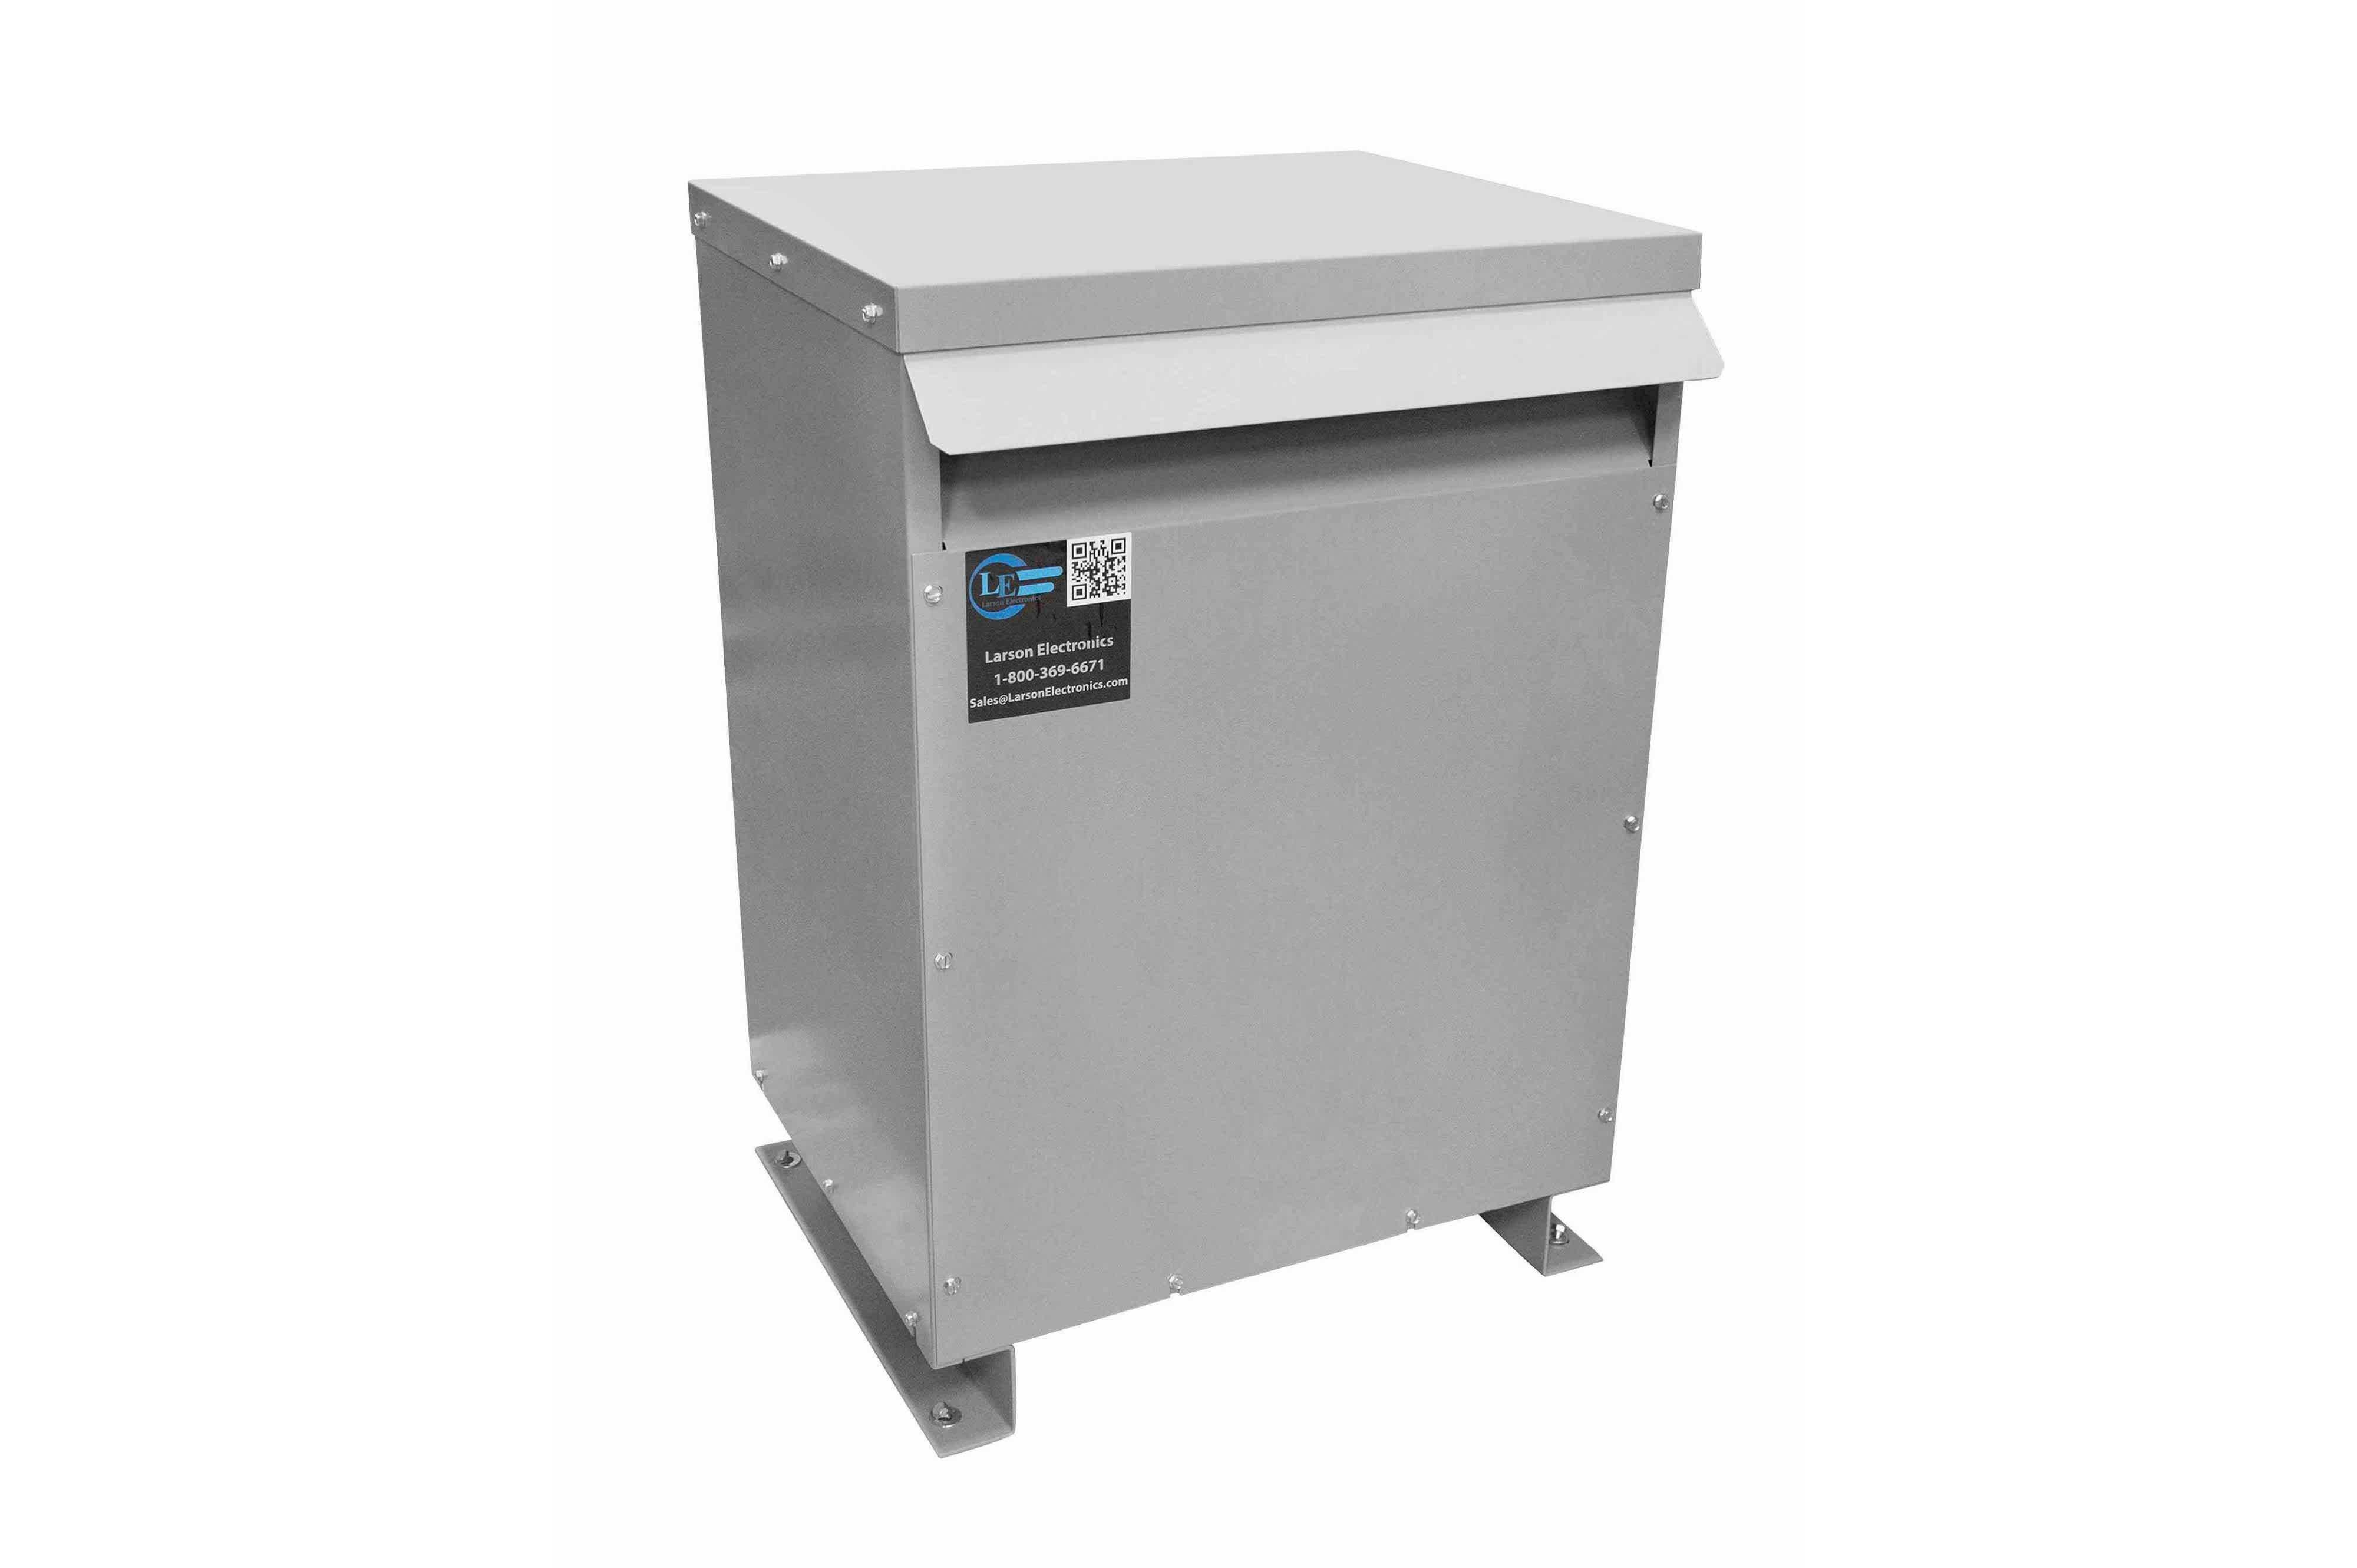 12 kVA 3PH Isolation Transformer, 240V Wye Primary, 208Y/120 Wye-N Secondary, N3R, Ventilated, 60 Hz